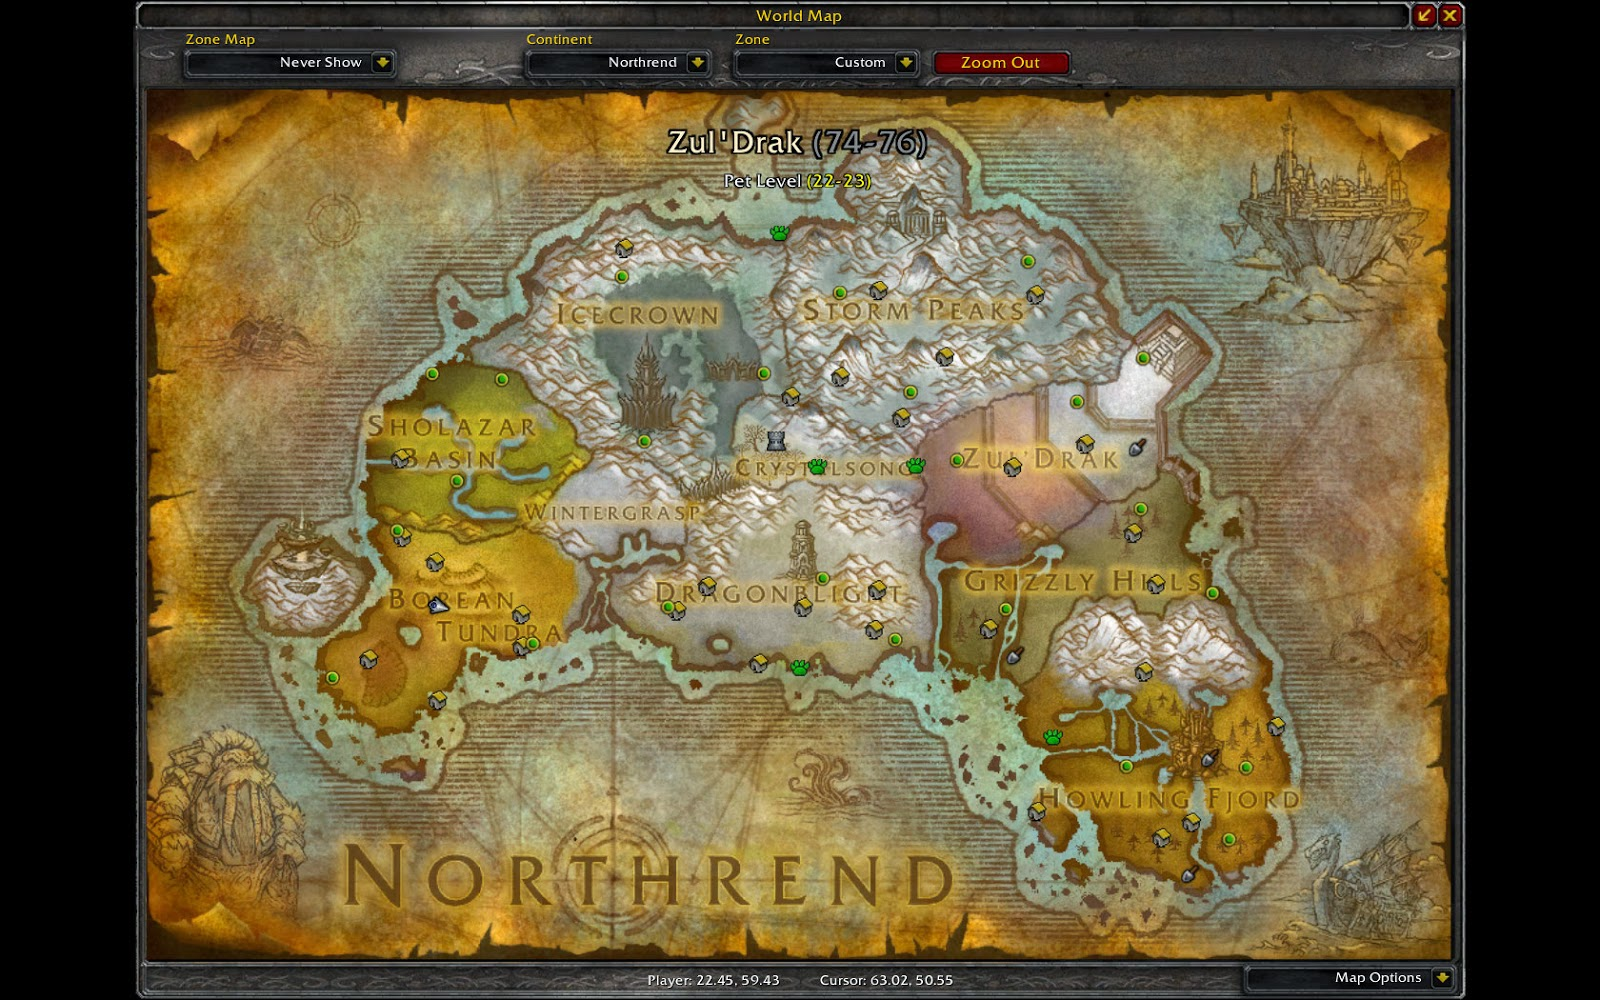 Tomtom world of warcraft map zebra world map microsoft world map map when go wow lkpriests world of warcraft blog obtaining gumiabroncs Gallery